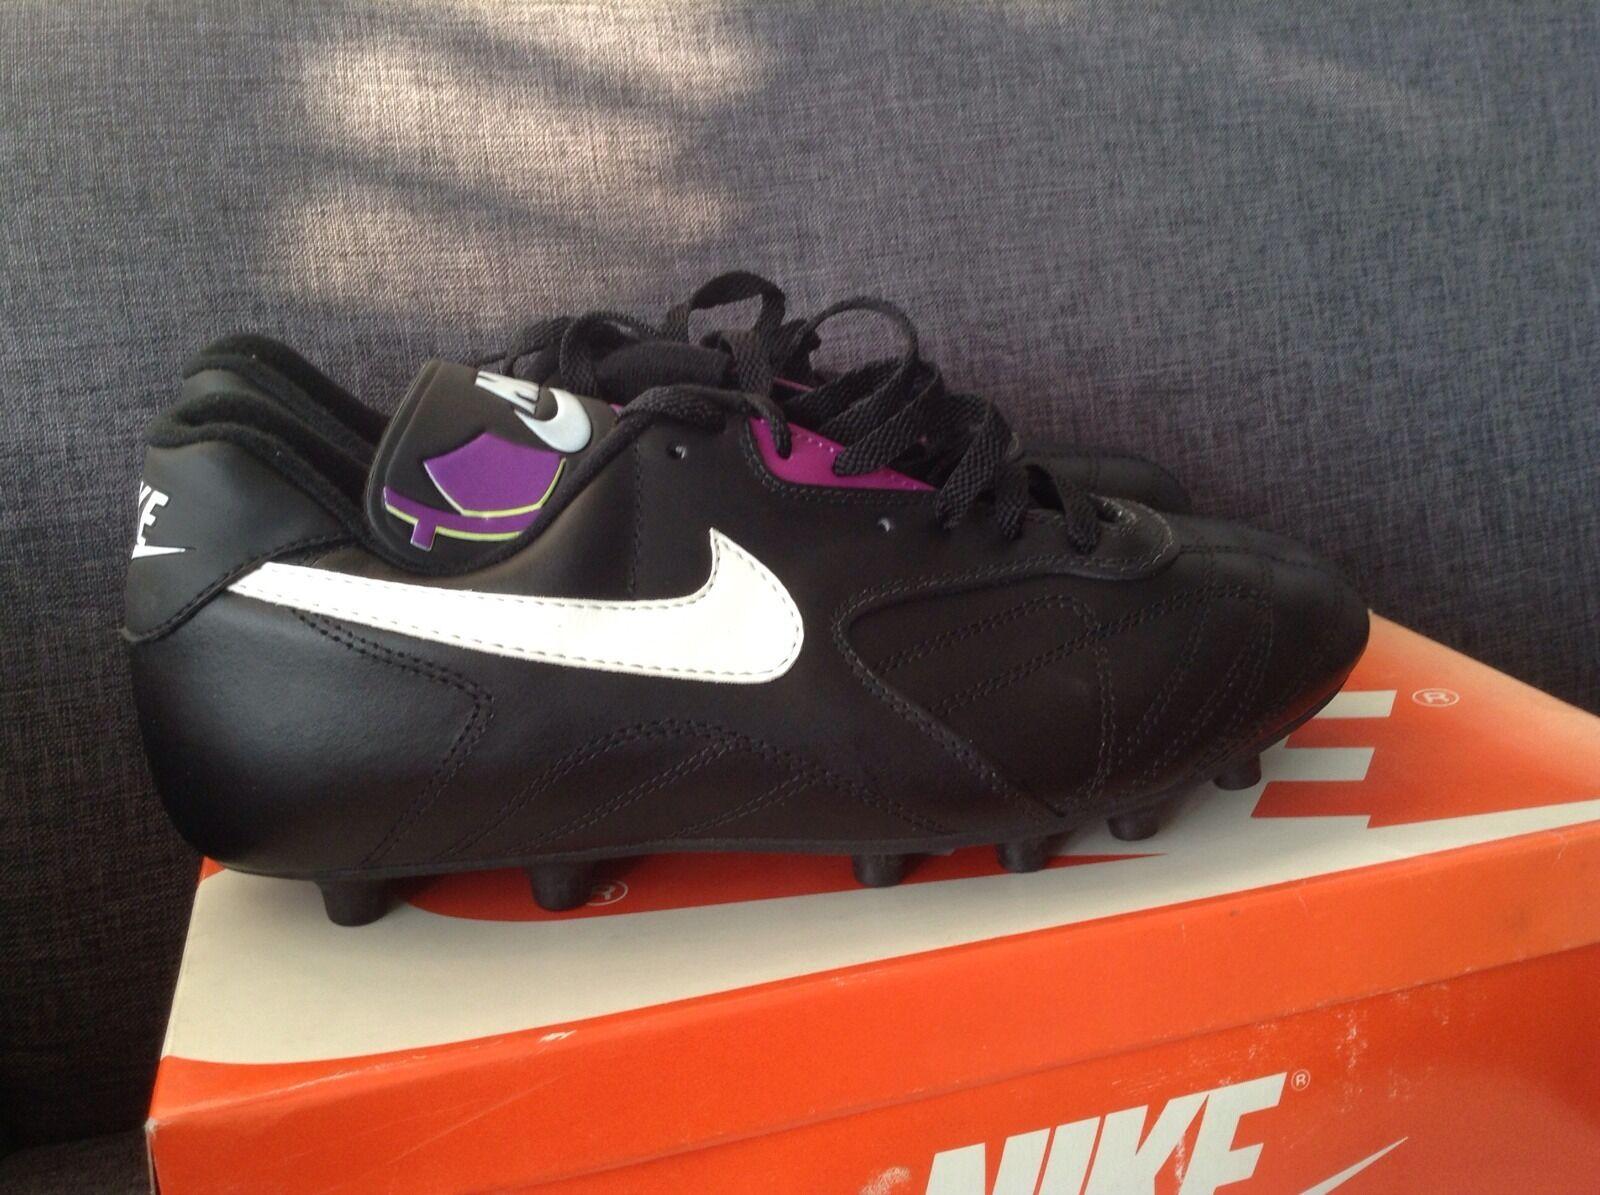 Nike Treviso M Vintage Deadstock Football boots soccer ronaldo 1992